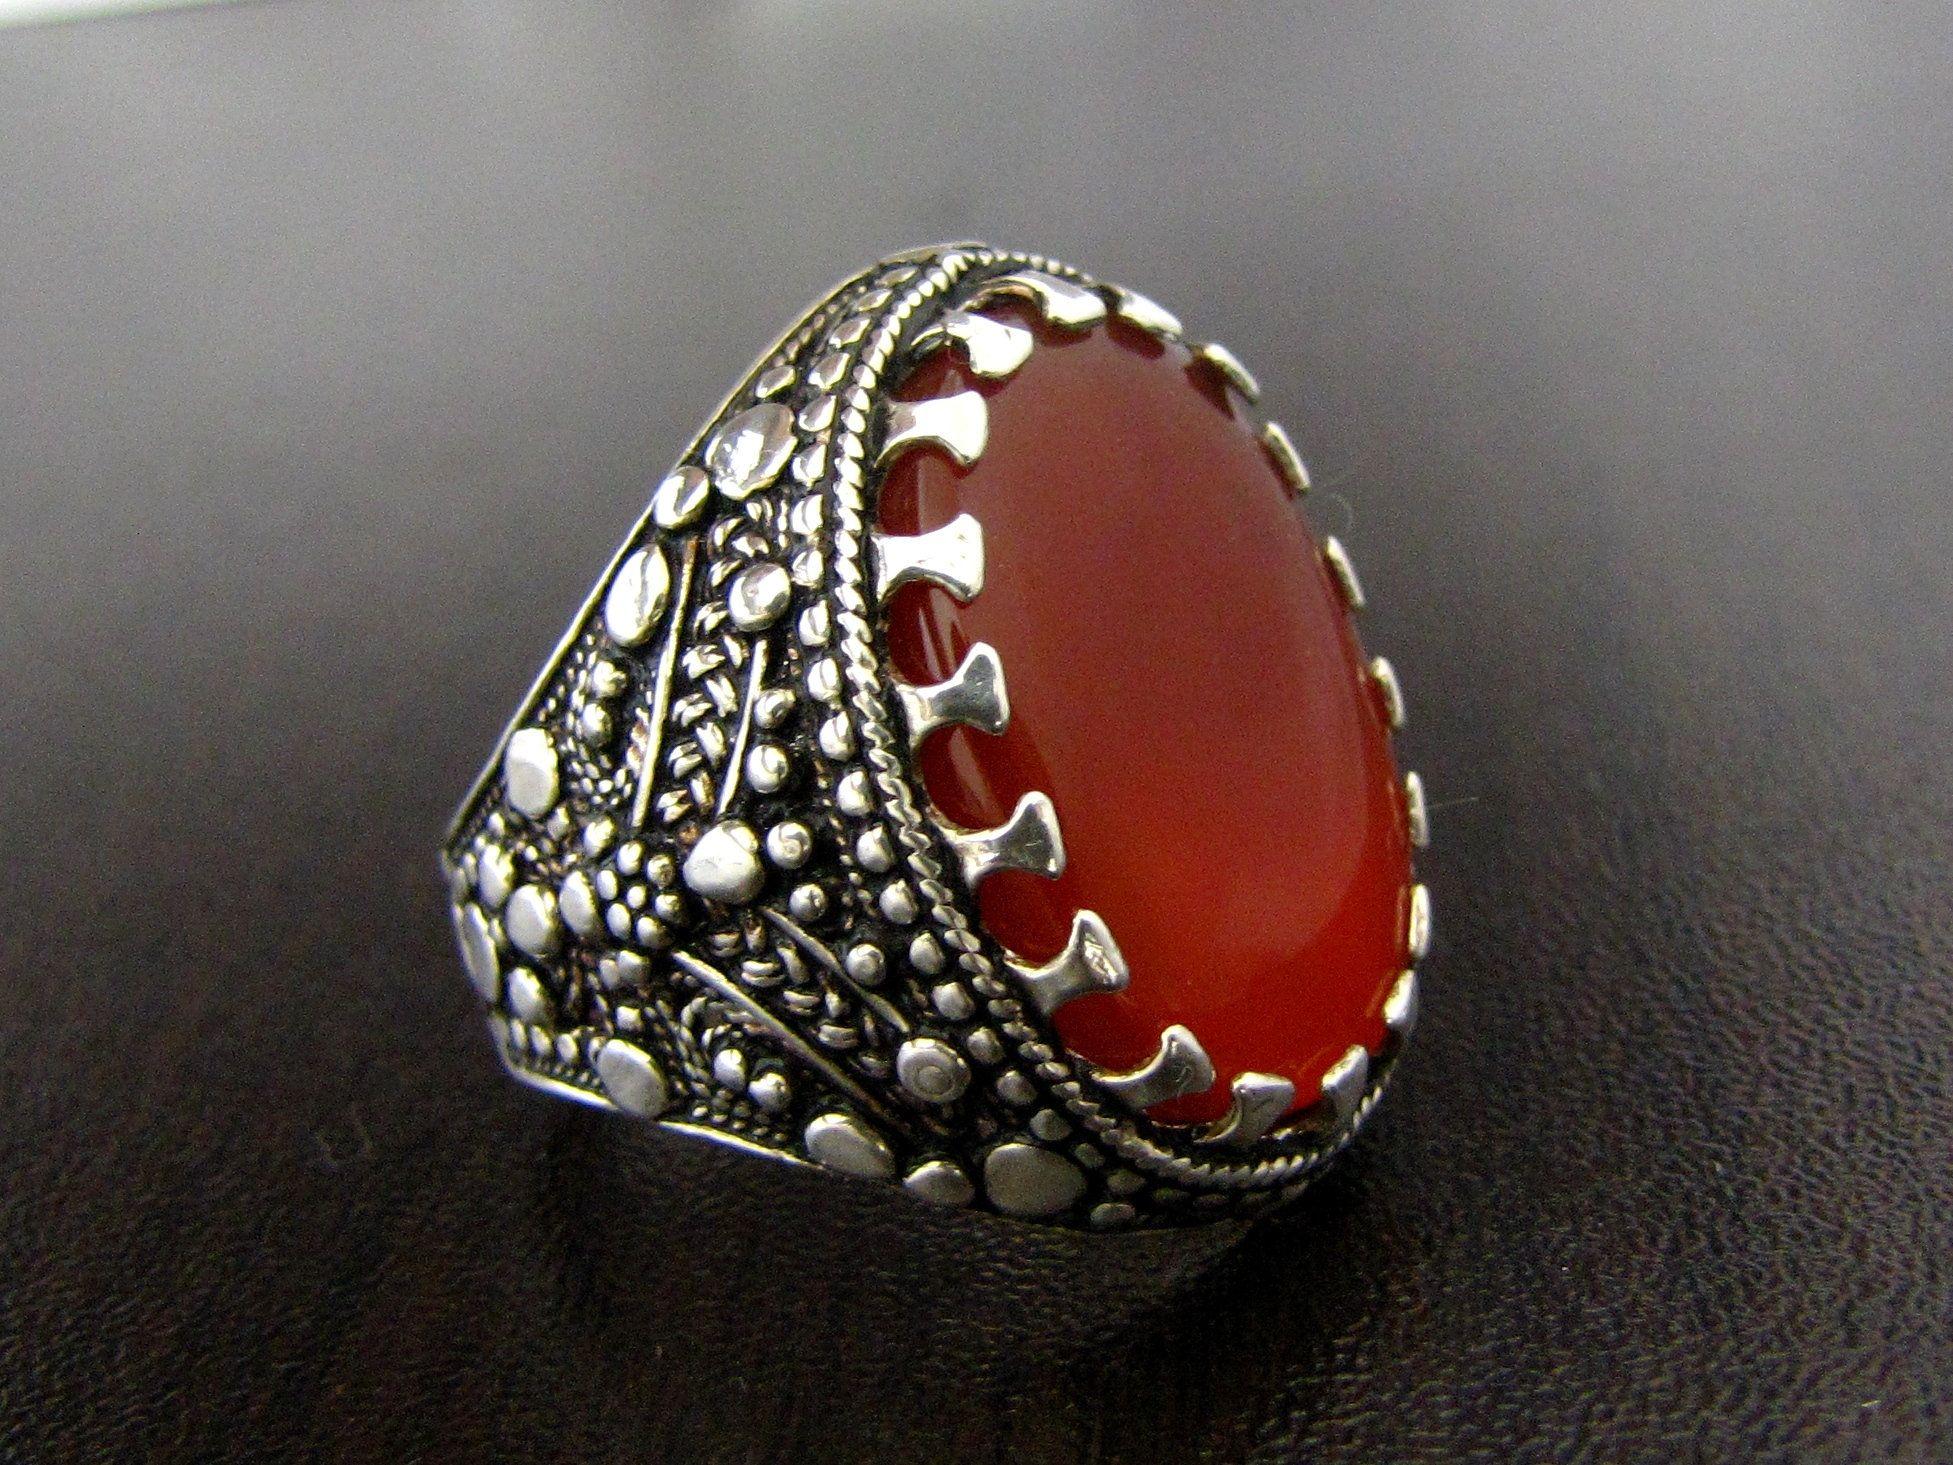 Artisenal Silver Ring With Genuine Yemeni Clear Red Agate Sz 9 5 Yemen Akik Aqeeq خاتم فضه صنعاني مع عقي Rare Pendant Elegant Necklaces Lovely Necklace